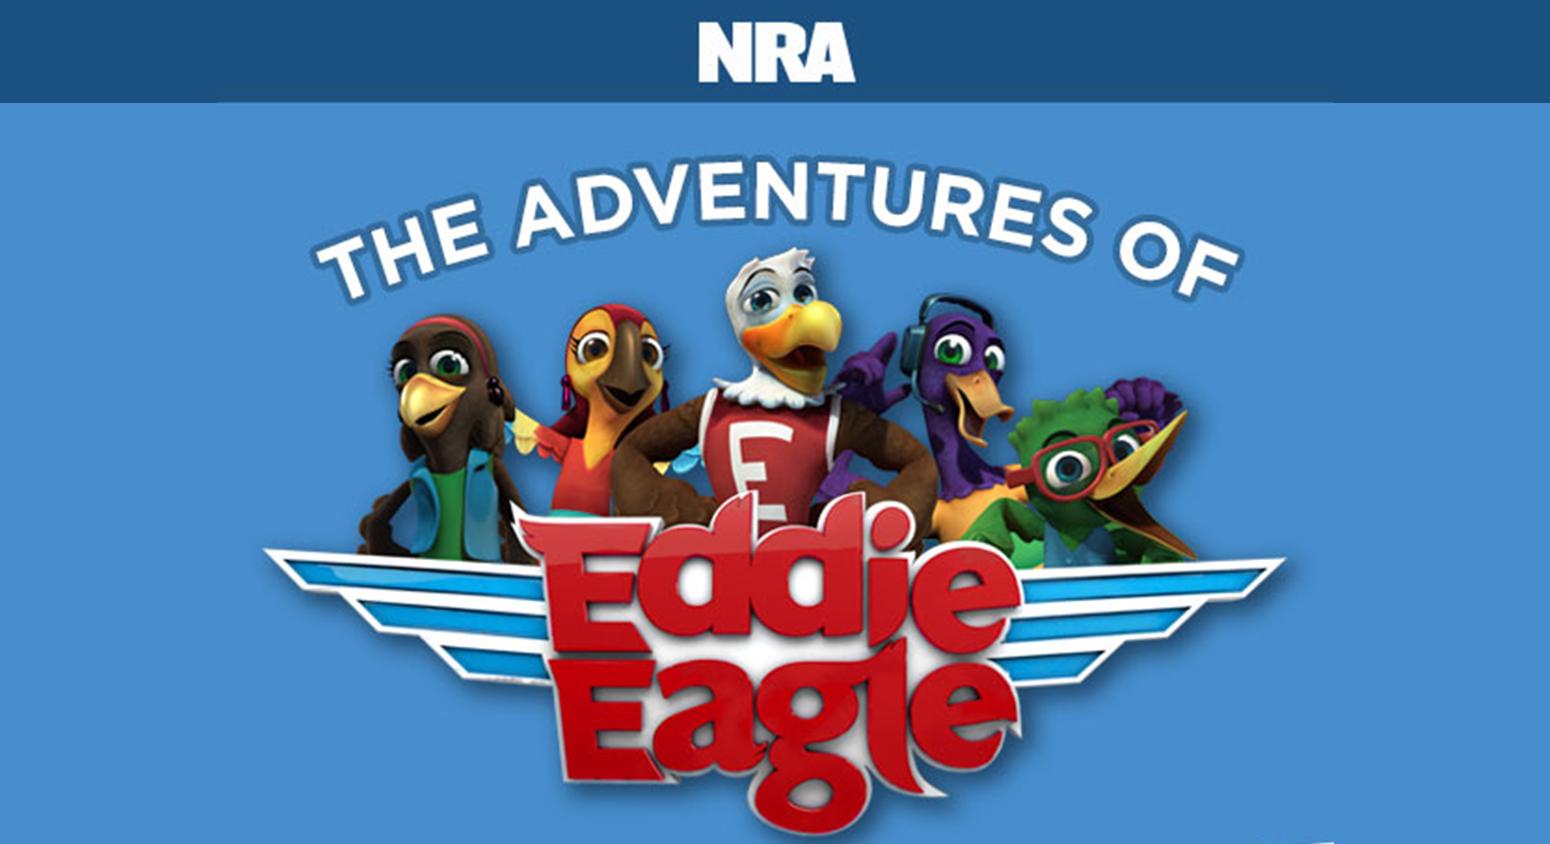 INFOGRAPHIC: The Adventures of Eddie Eagle